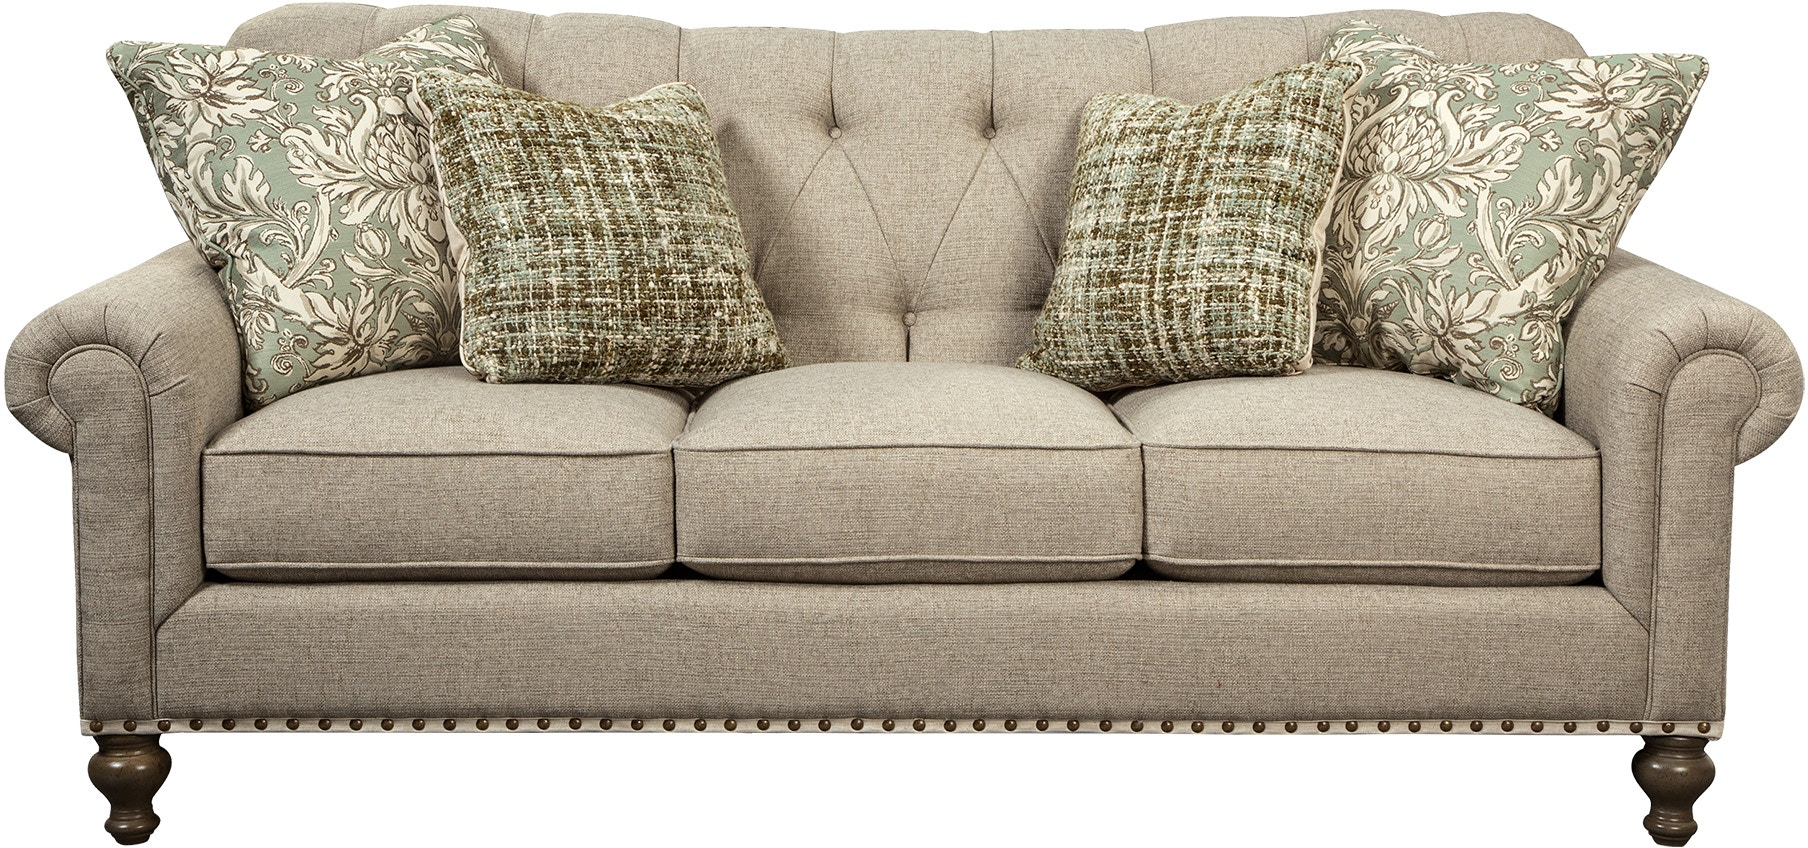 Paula Deen By Craftmaster Living Room Sofa P754150bd Craftmaster